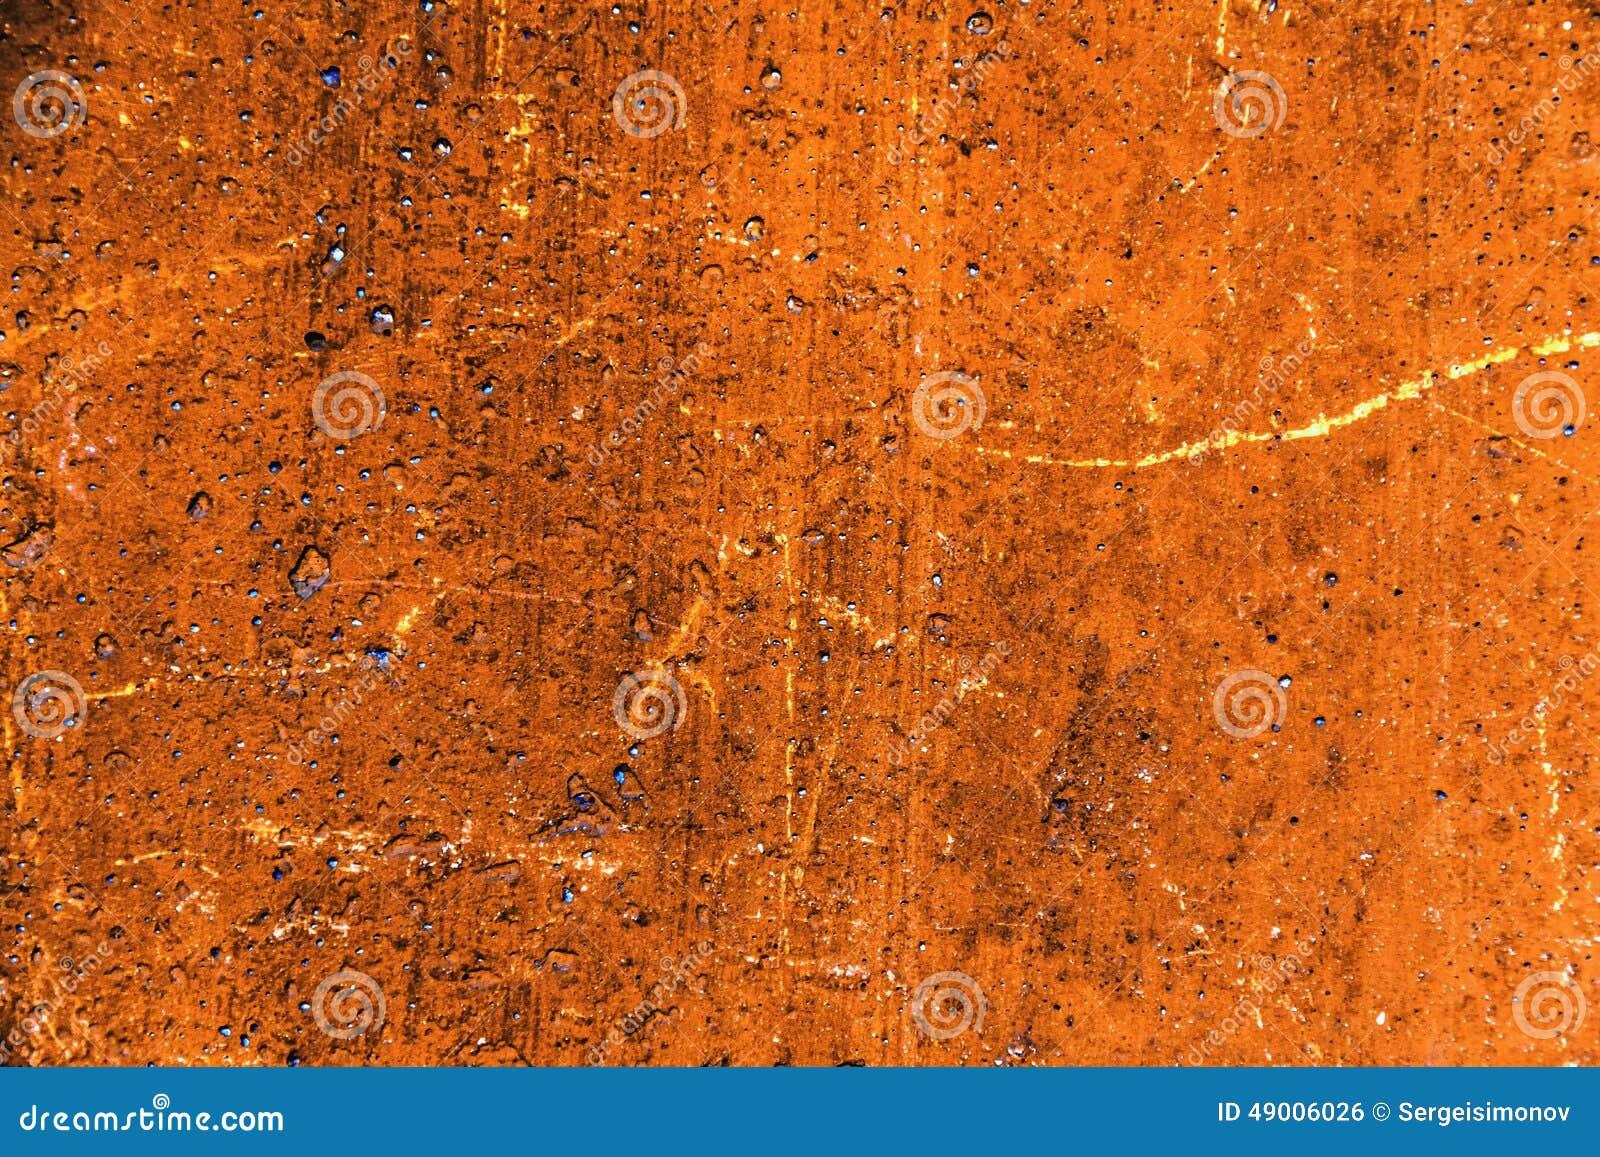 Orange Cement Wall : Plaster or cement texture orange color stock photo image